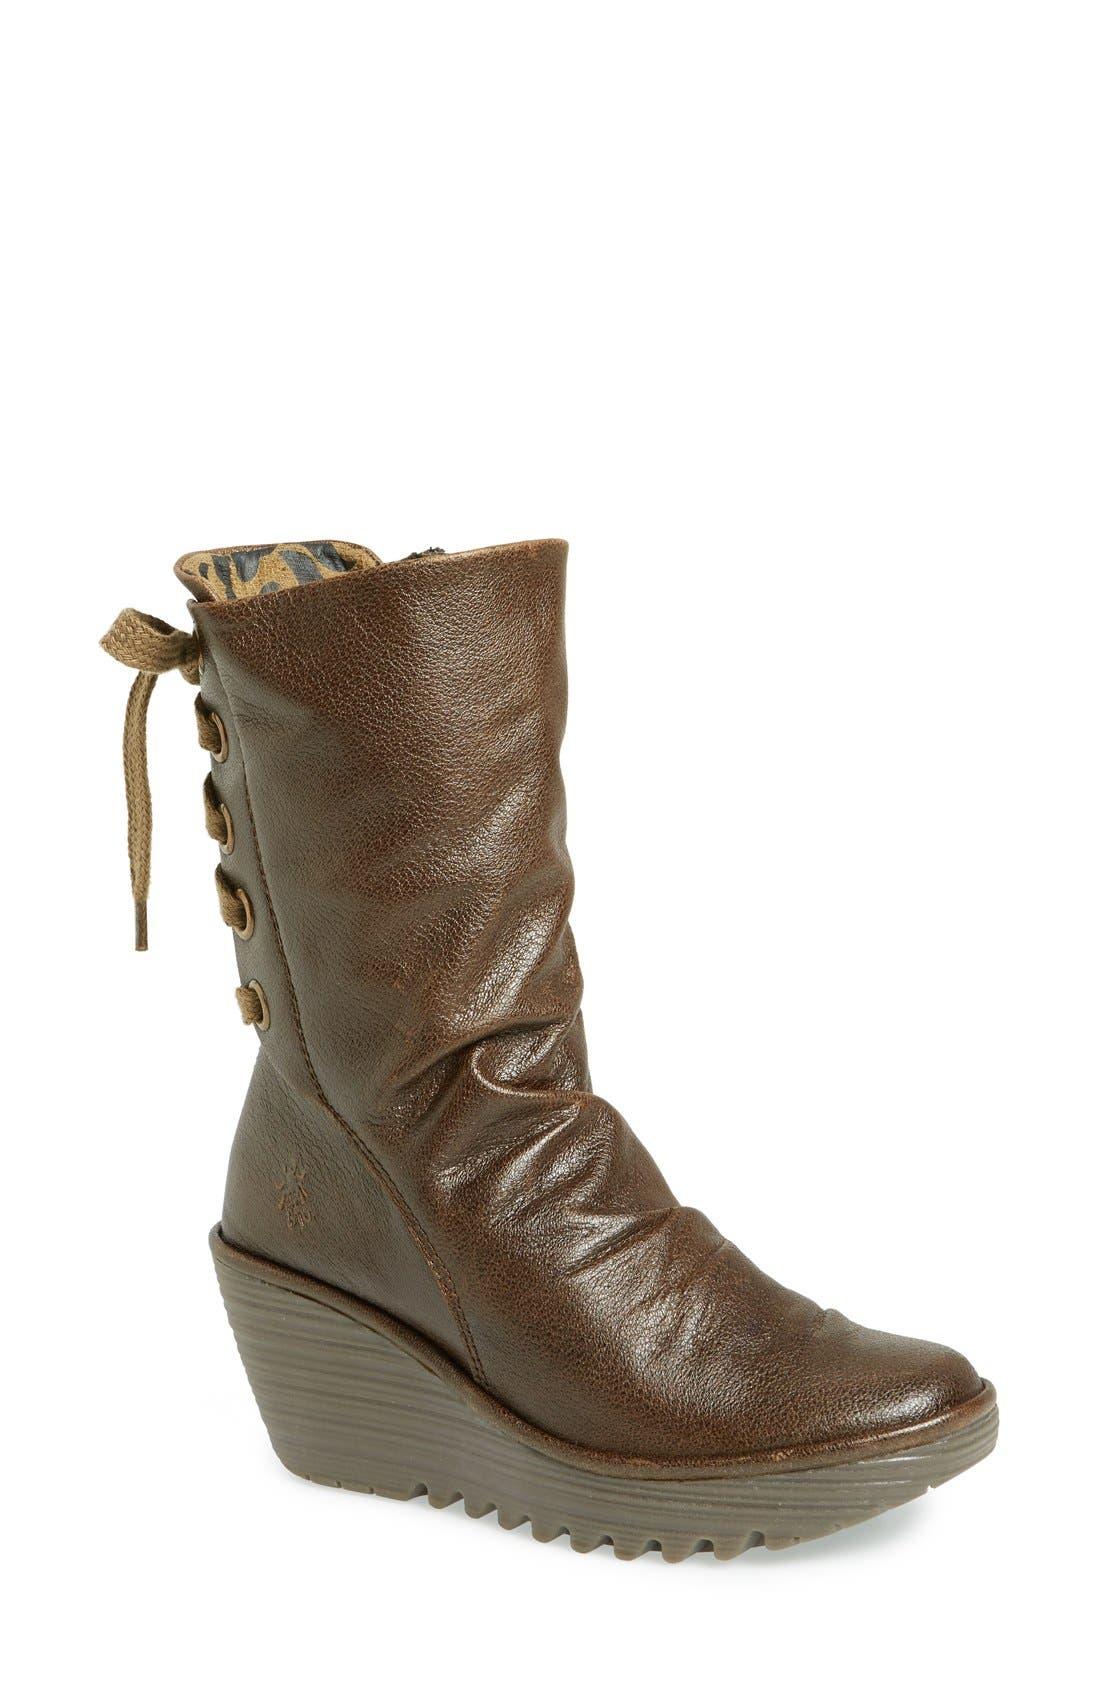 Main Image - Fly London 'Yada' Boot (Women)